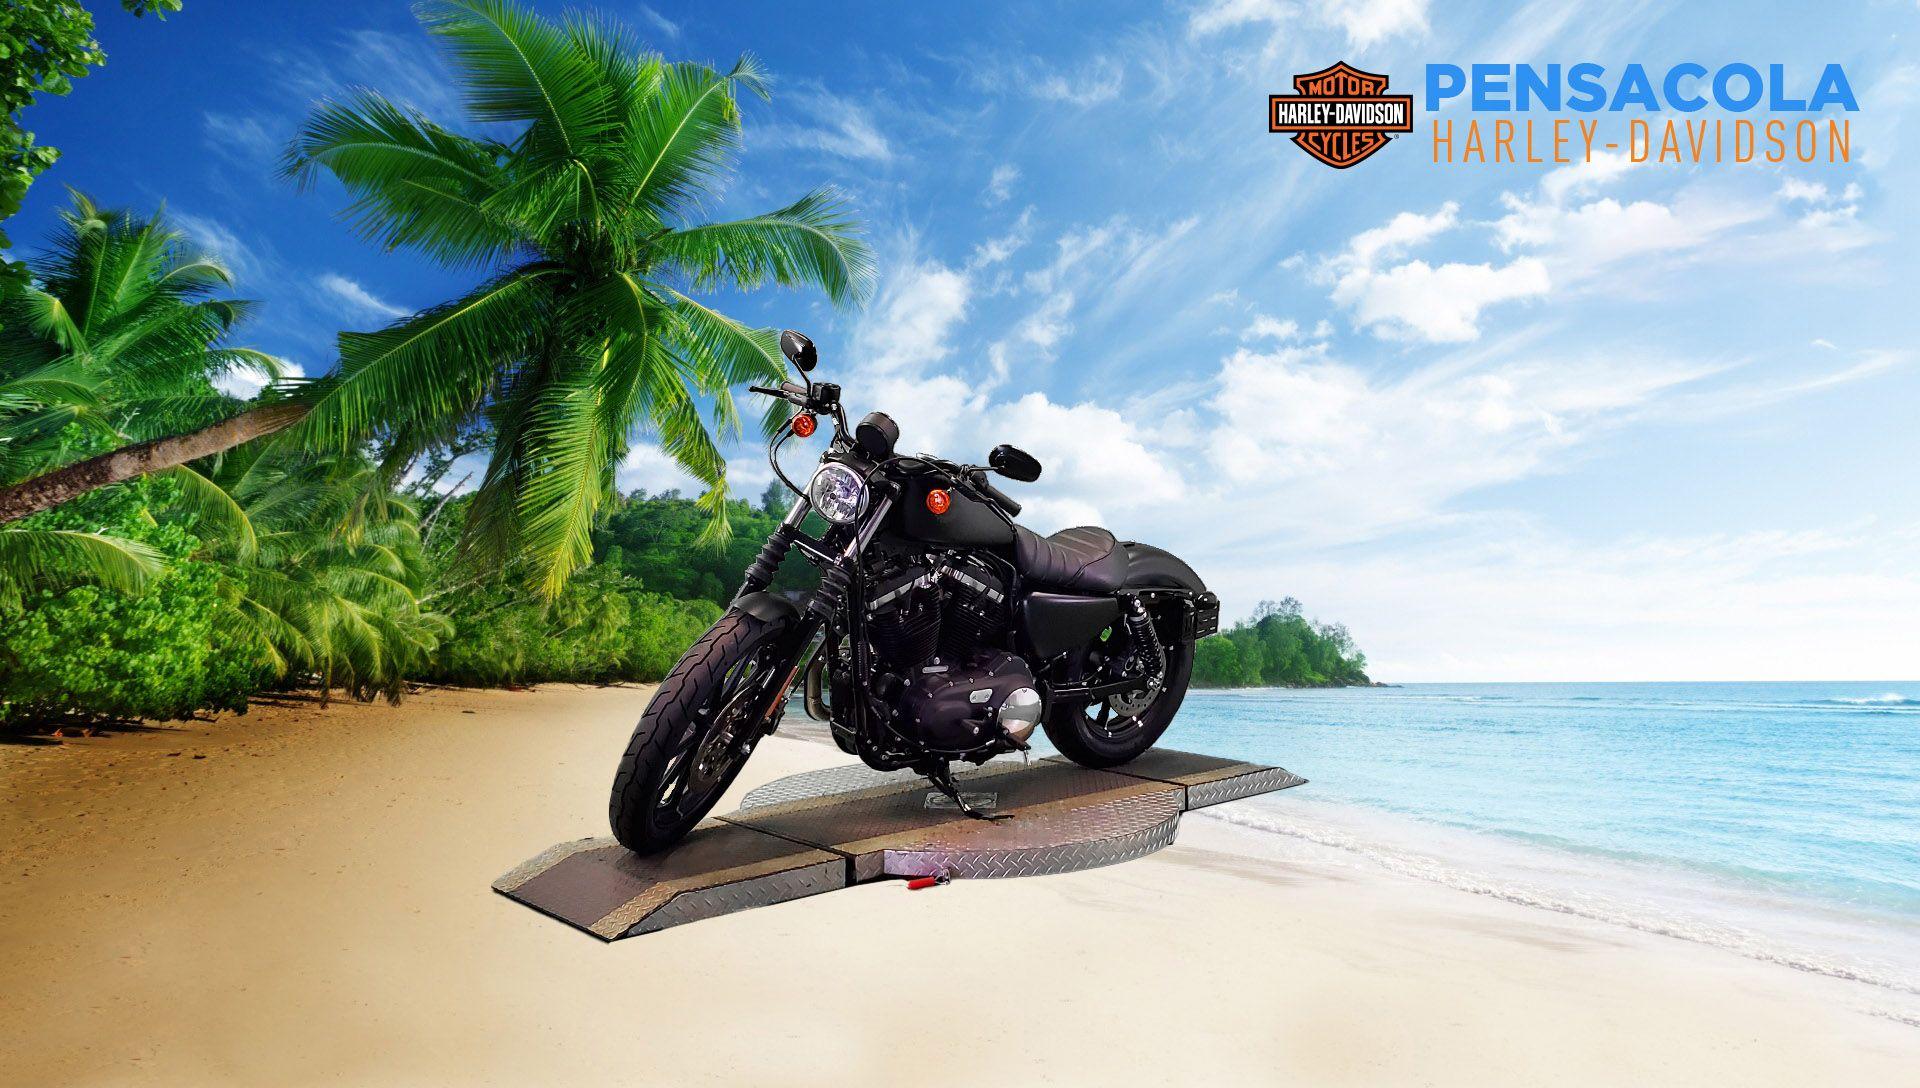 New 2021 Harley-Davidson Iron 883 XL883N